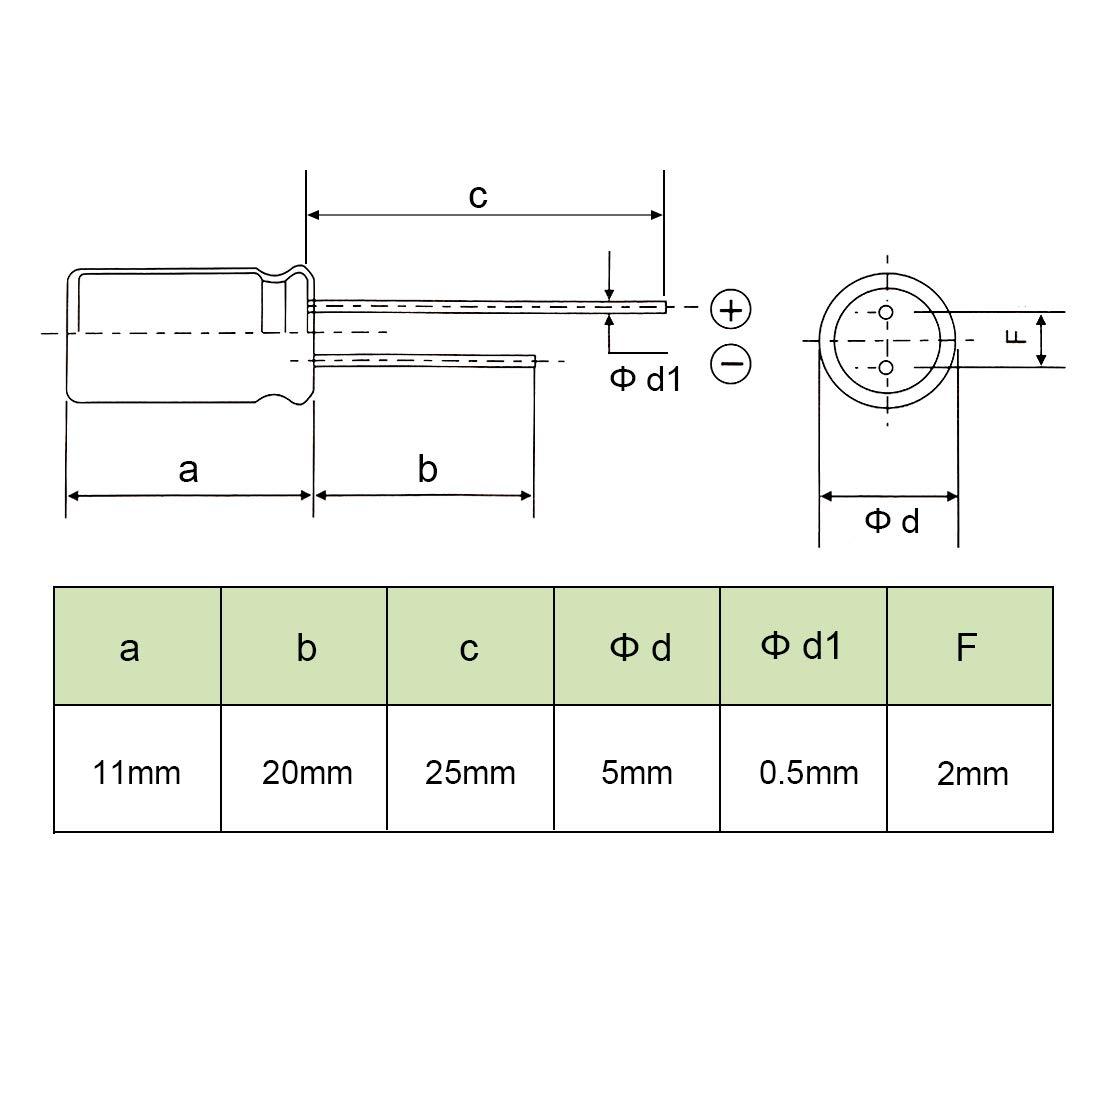 sourcing map 30stk Aluminium Radial Elektrolytkondensator 2200uF 16V Life 10 x 20 mm Schwarz de